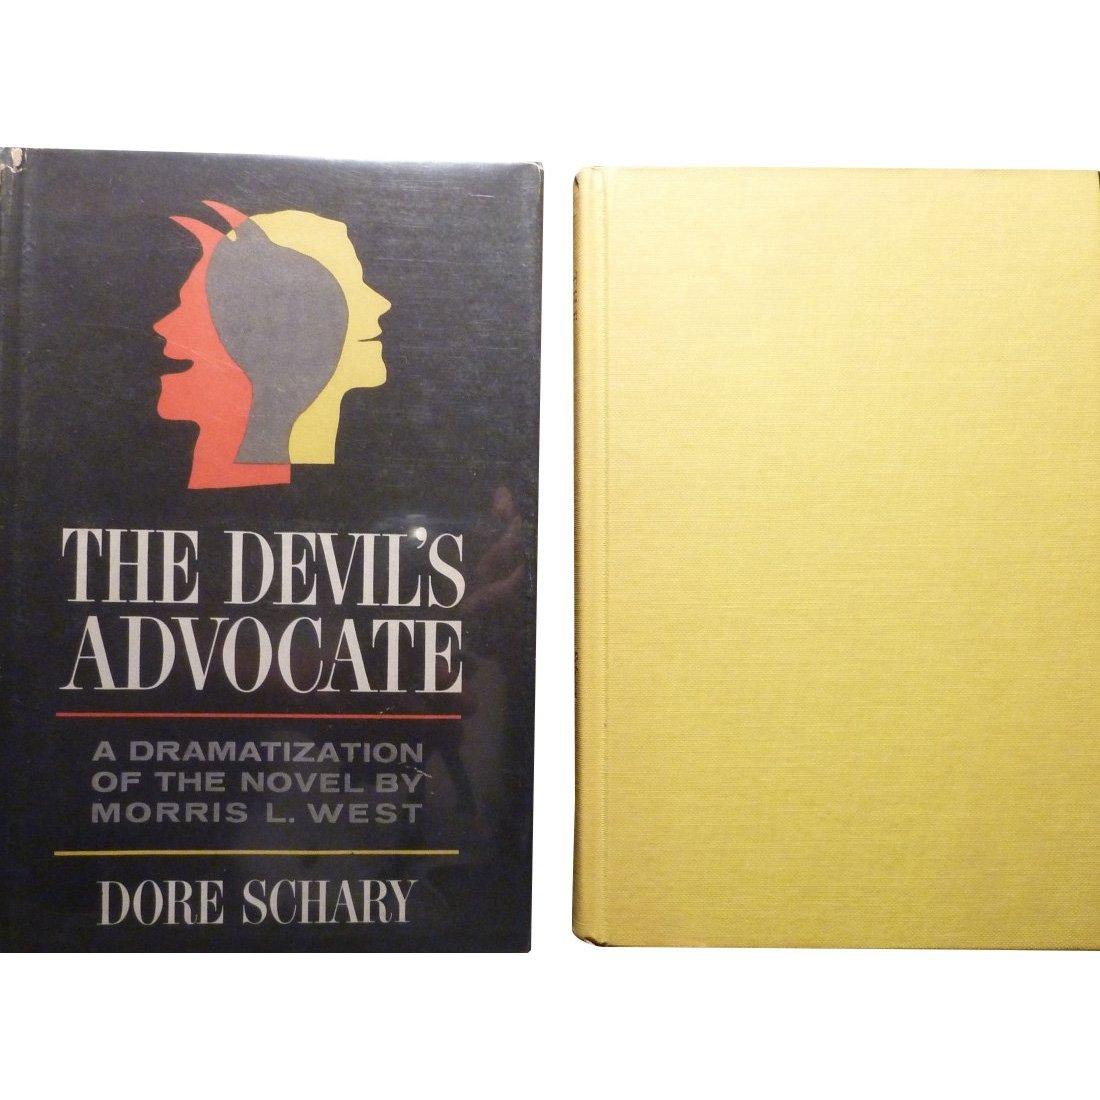 Dore Schary: The Devil's Advocate - Signed